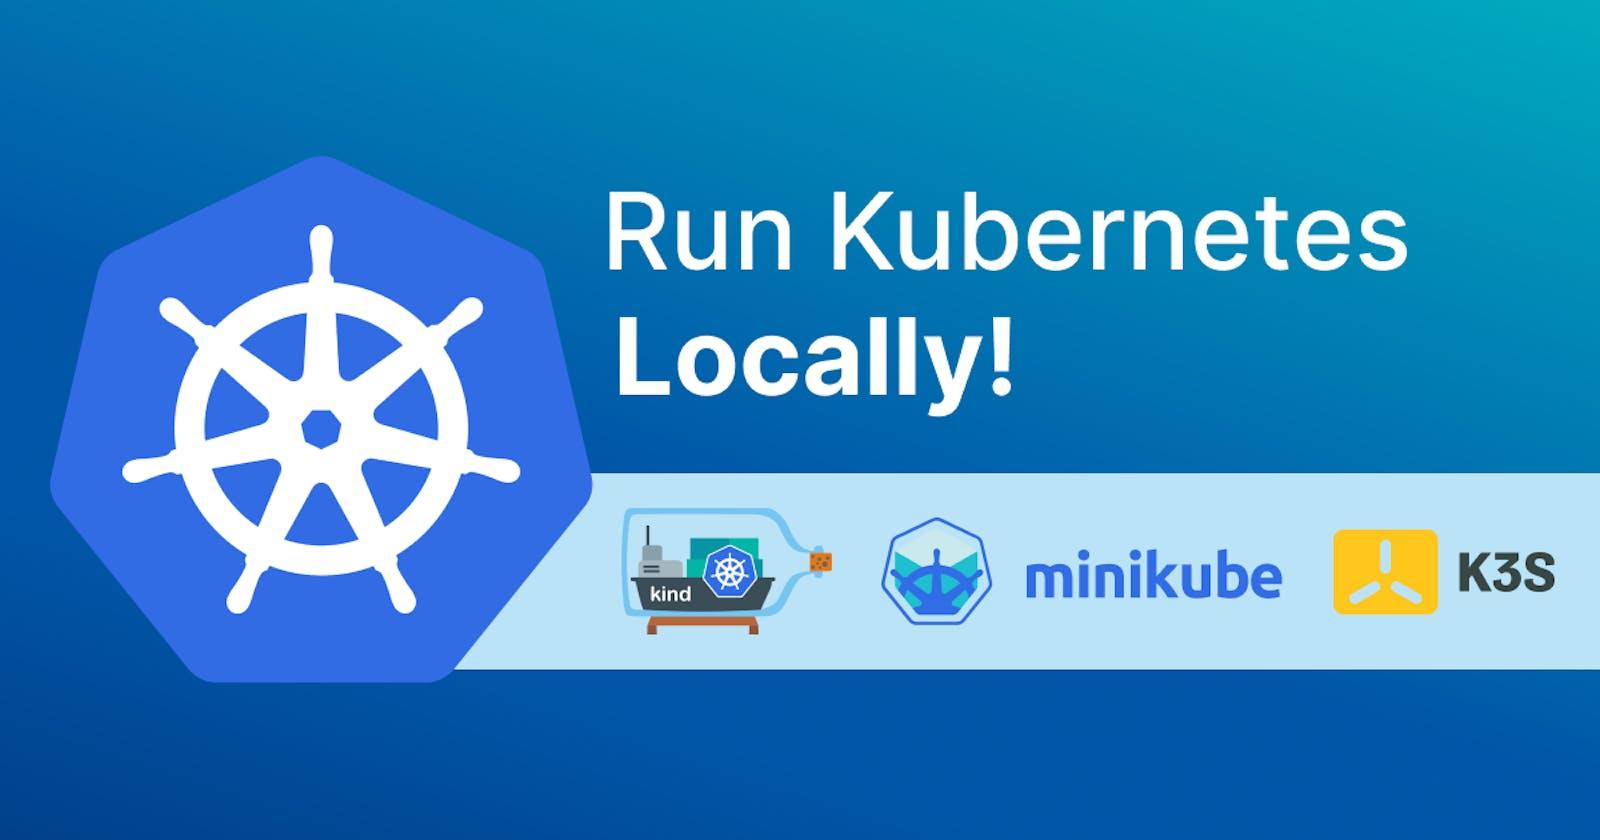 6 Tools to Run Kubernetes Locally